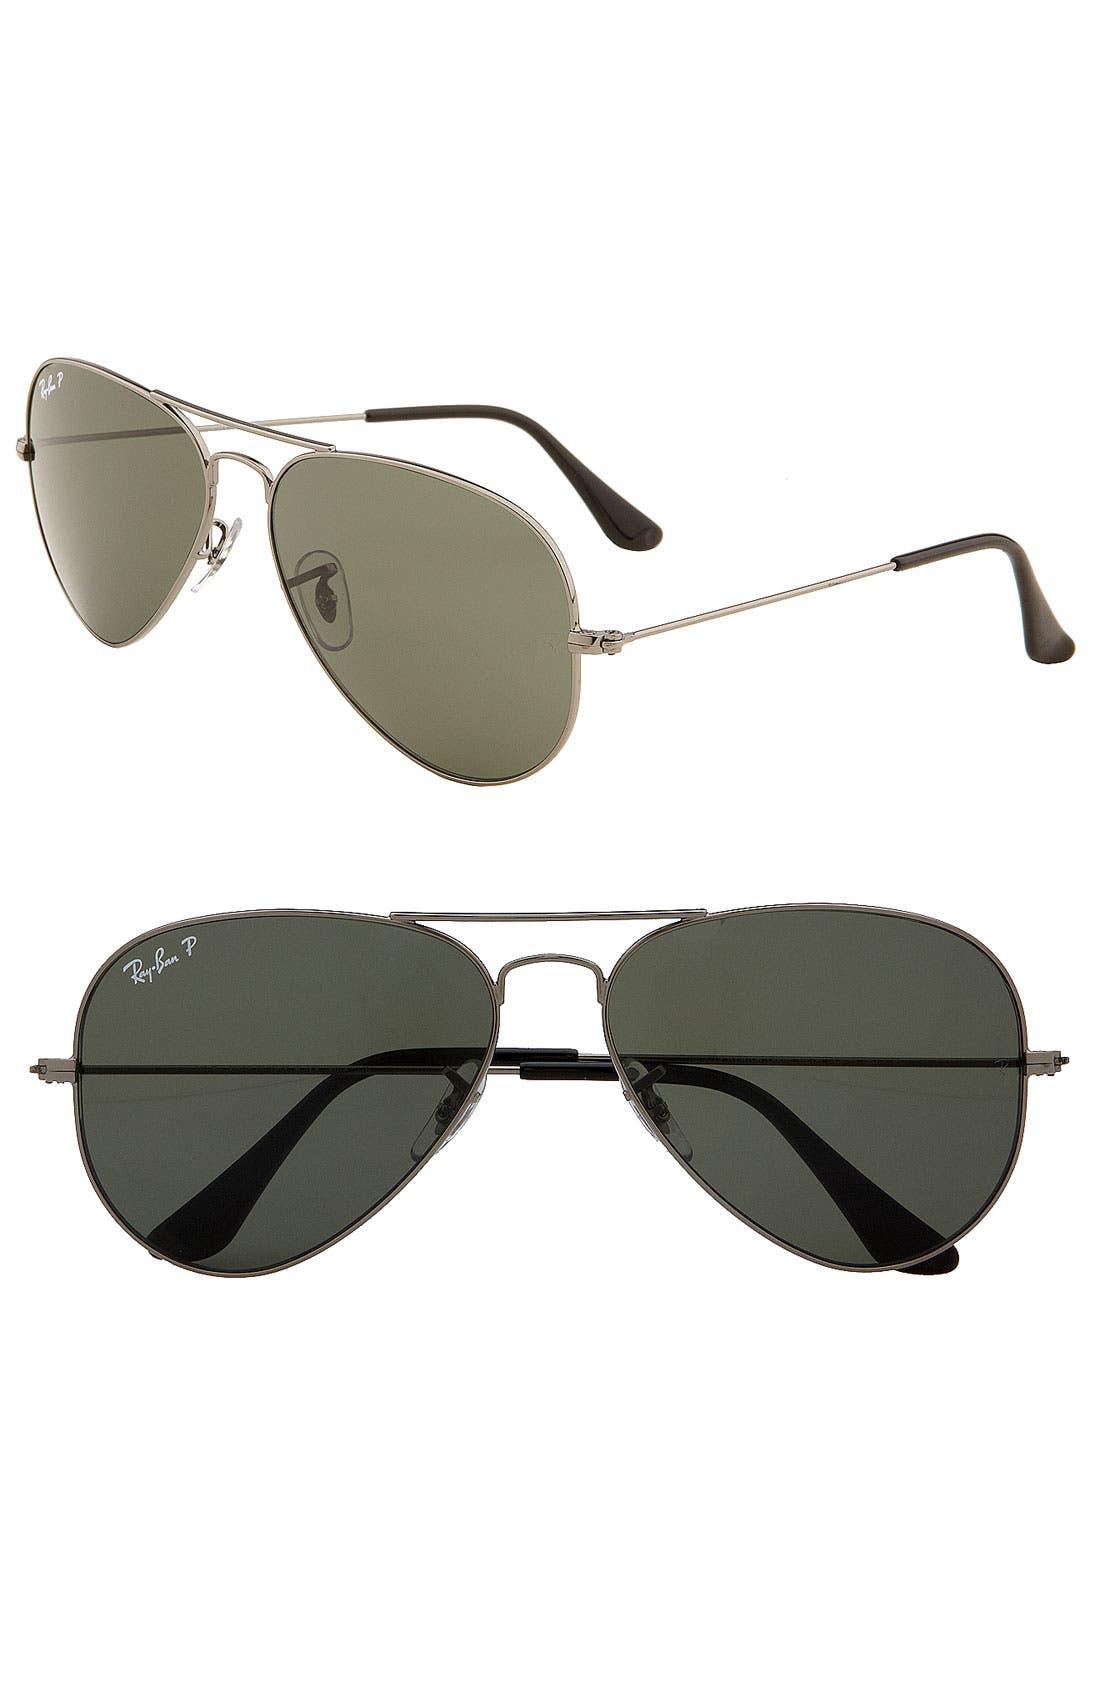 Ray-Ban Original 5m Aviator Sunglasses - Lite Pewter